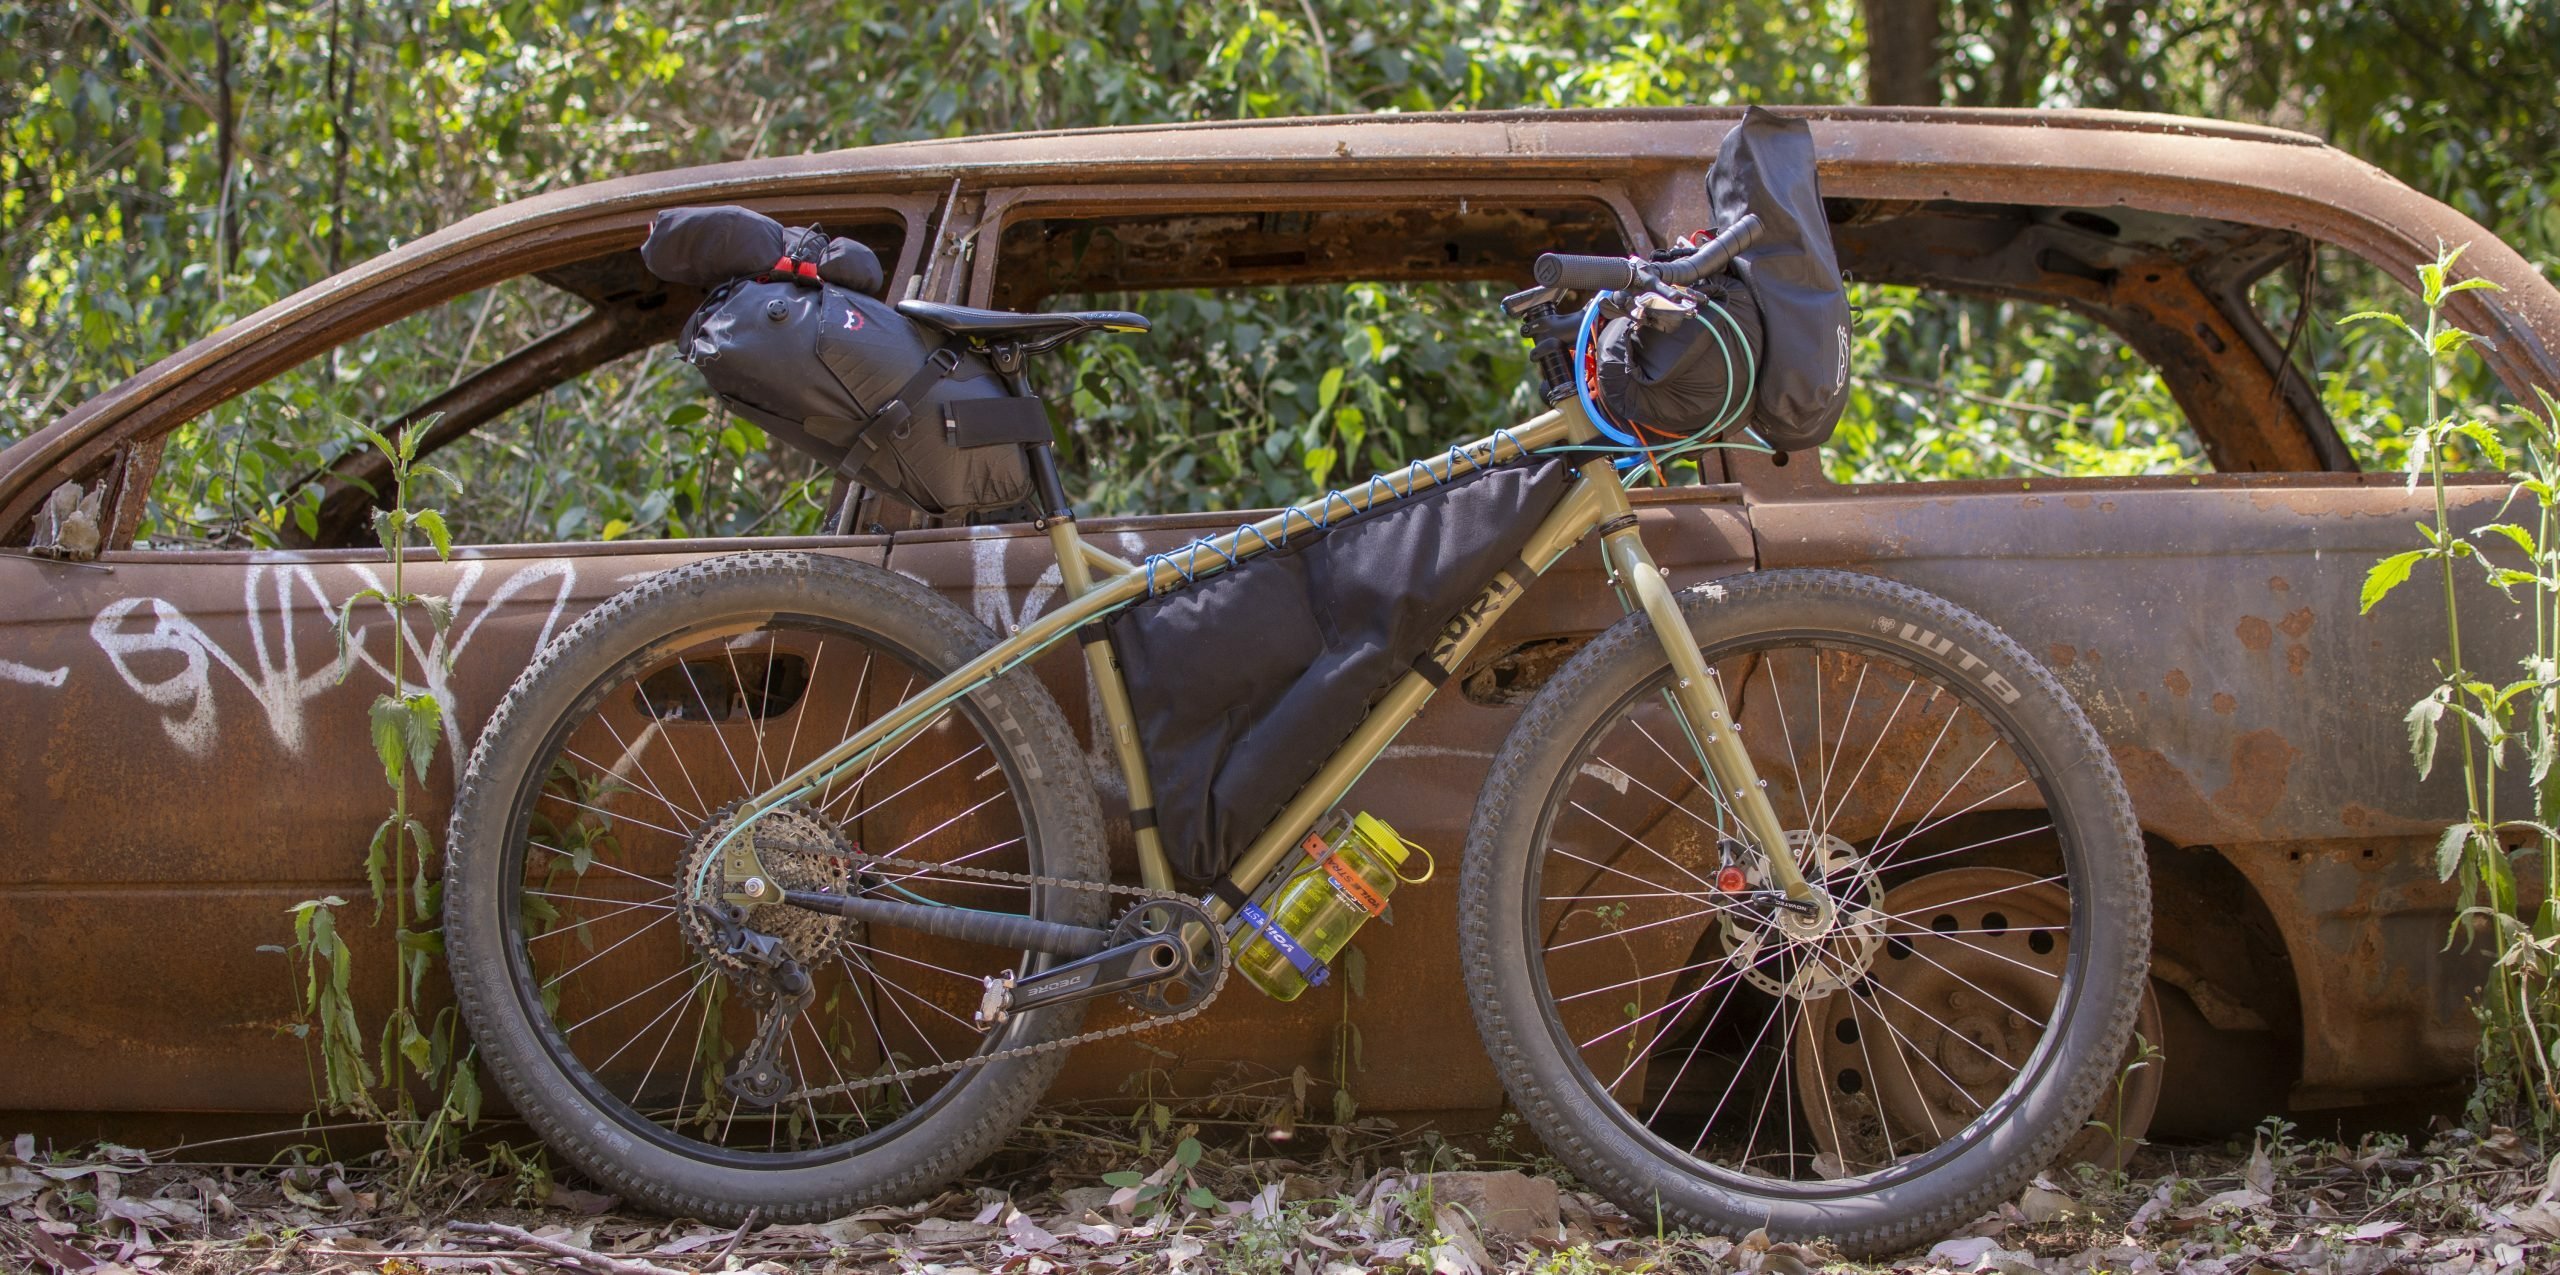 Surly bikes bushpig in bikepacking mode